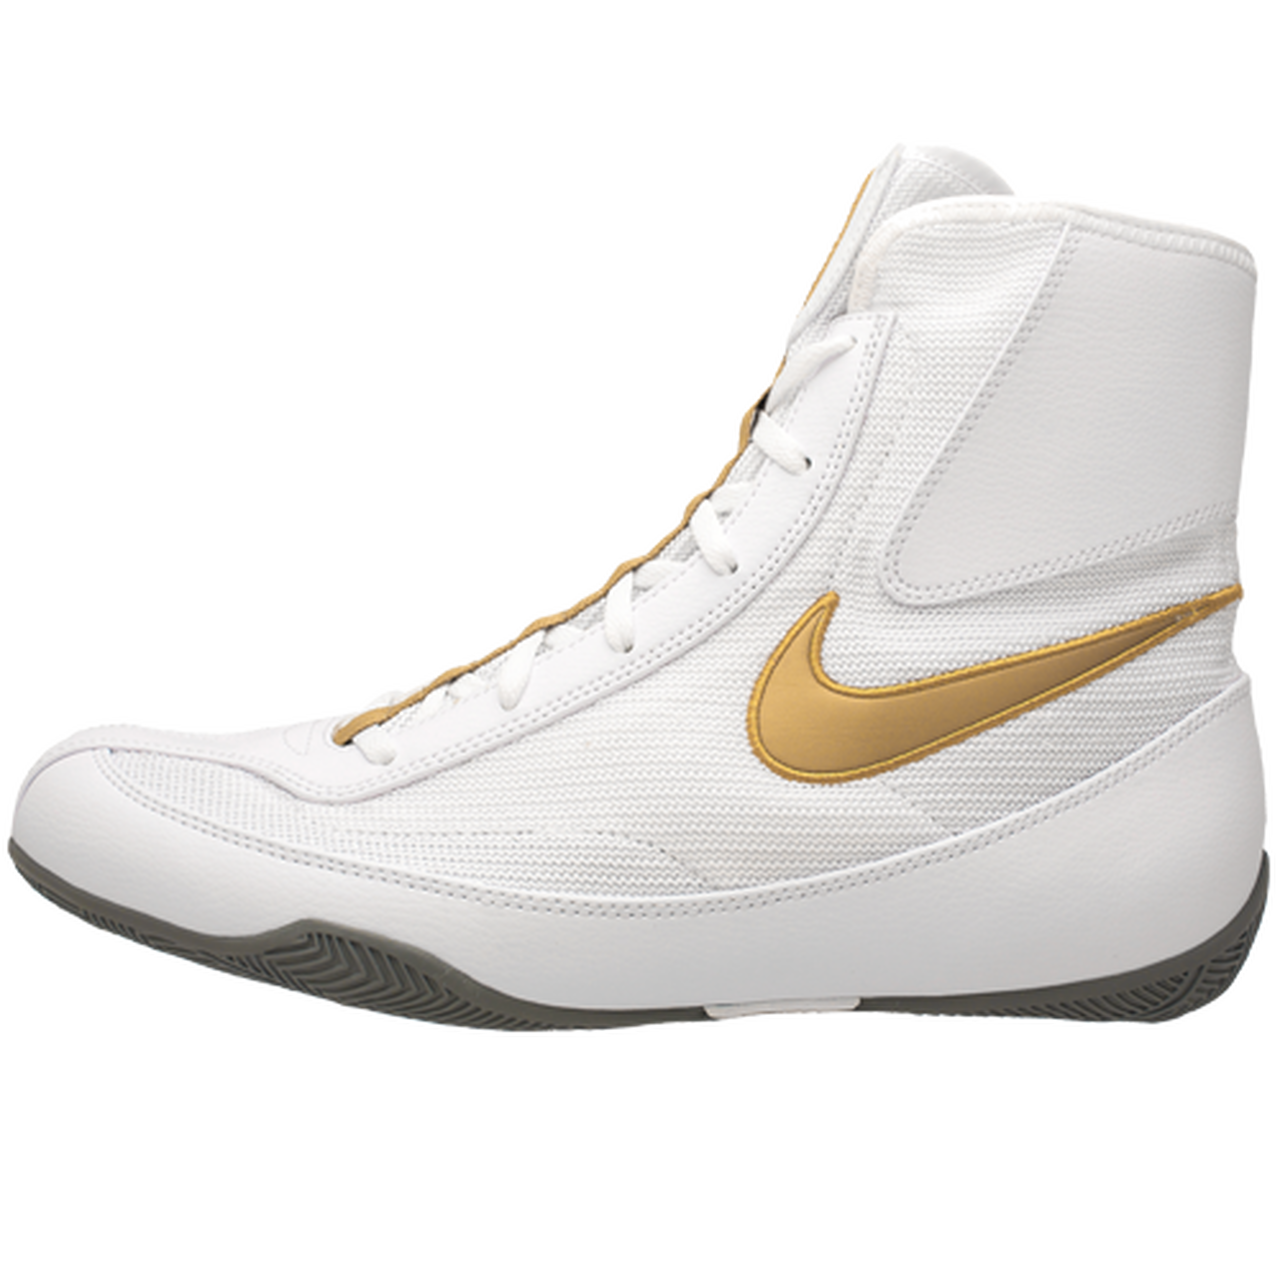 Nike Machomai 2.0 White/Gold Boxing Shoes